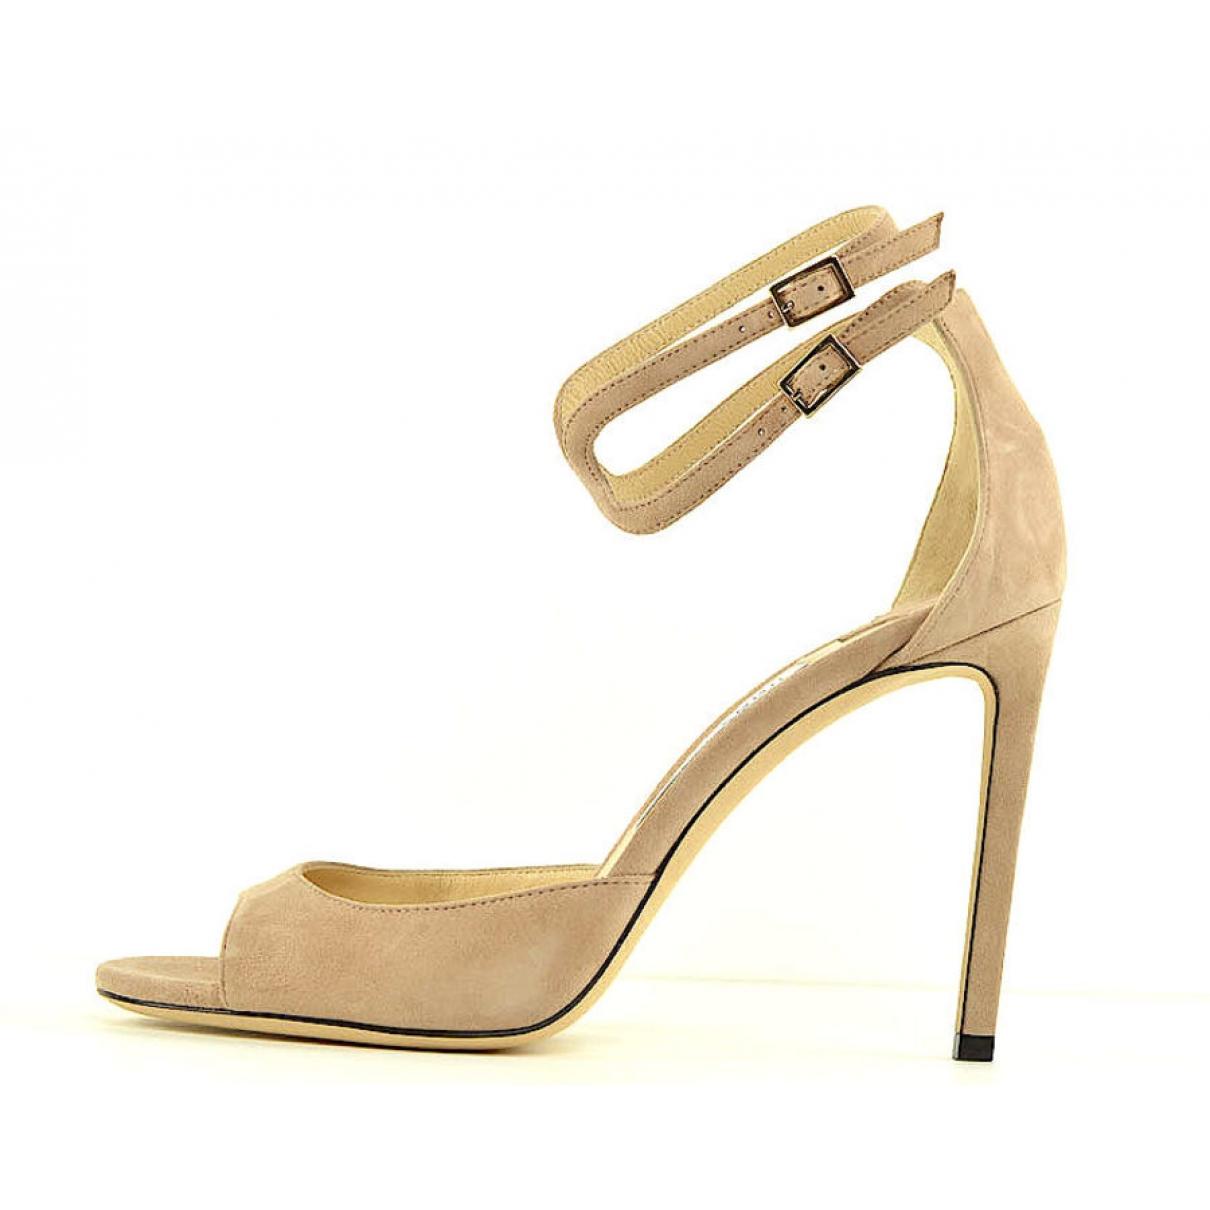 Jimmy Choo - Sandales   pour femme en suede - beige